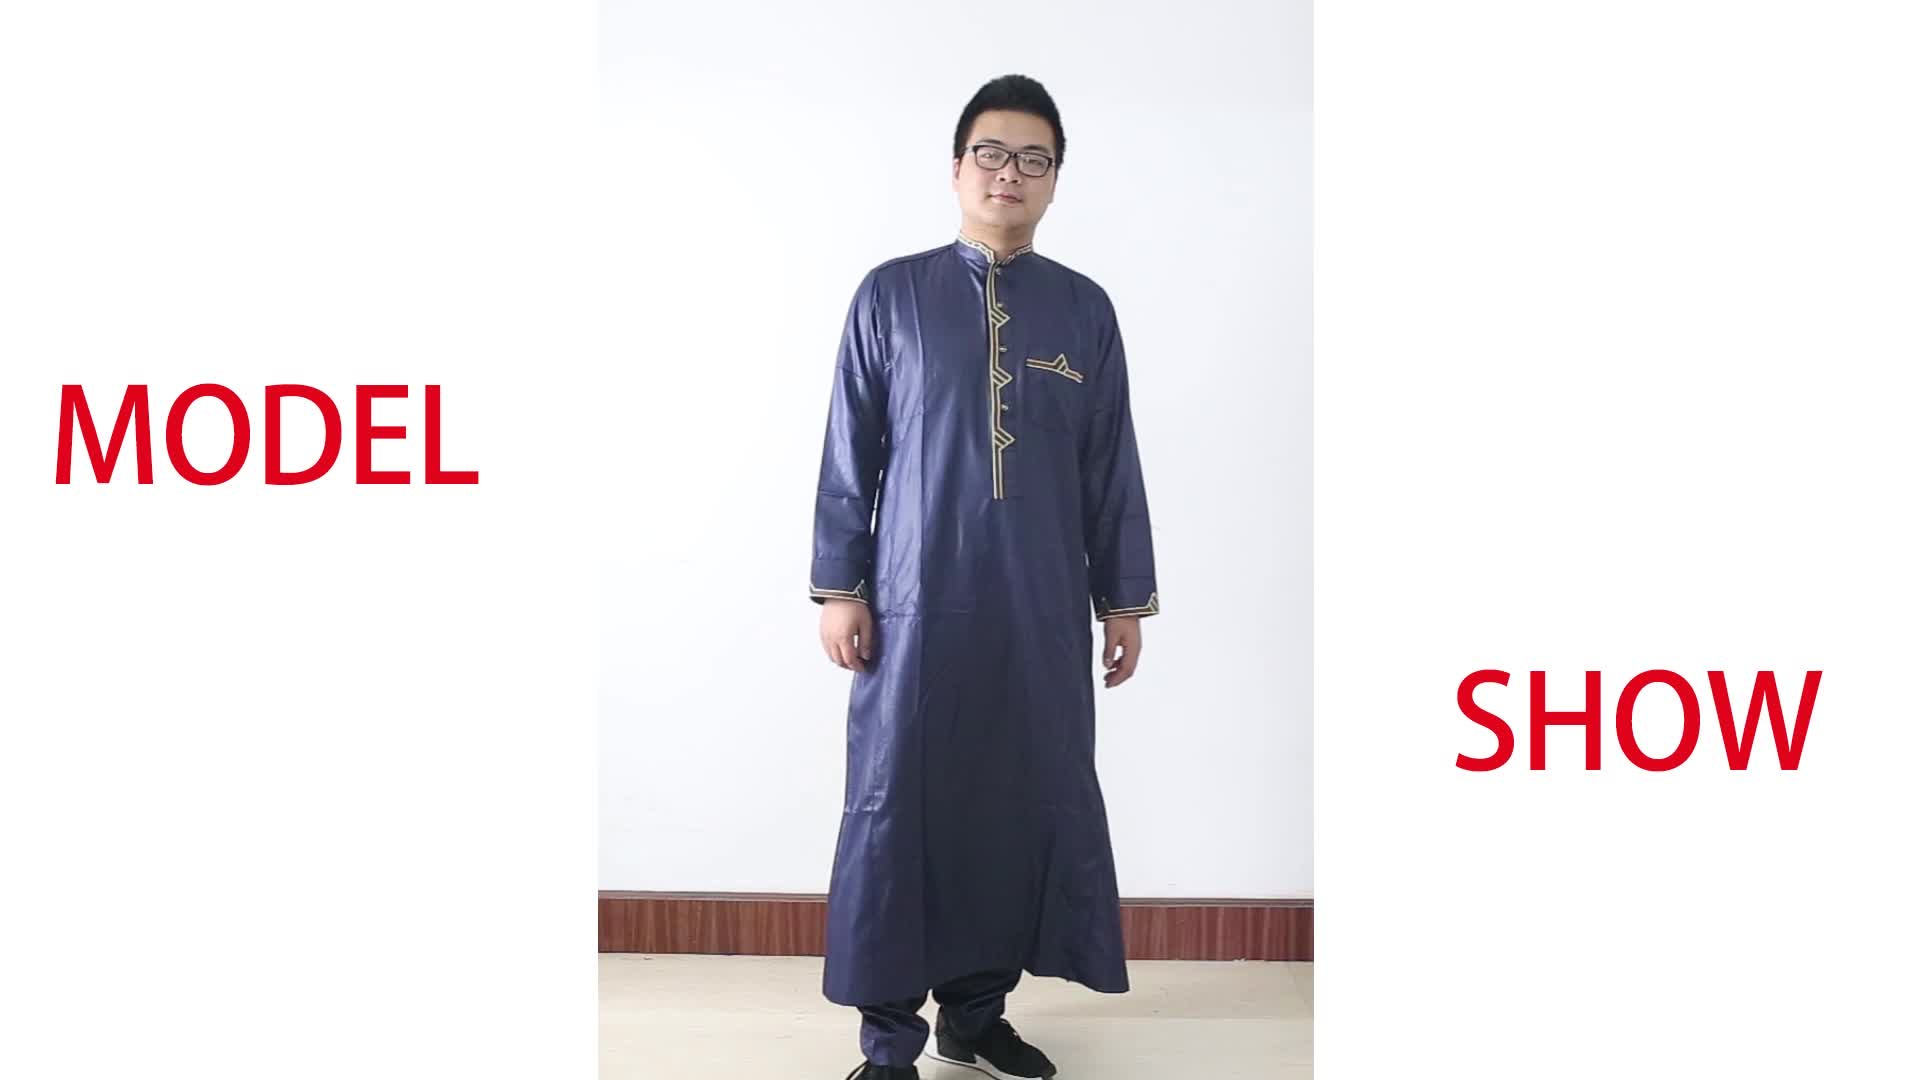 H & D Fabriek Prijs 10 STKS MOQ Dashiki Shirts Groothandel Textiel Bazin Afrikaanse Kleding Voor Man